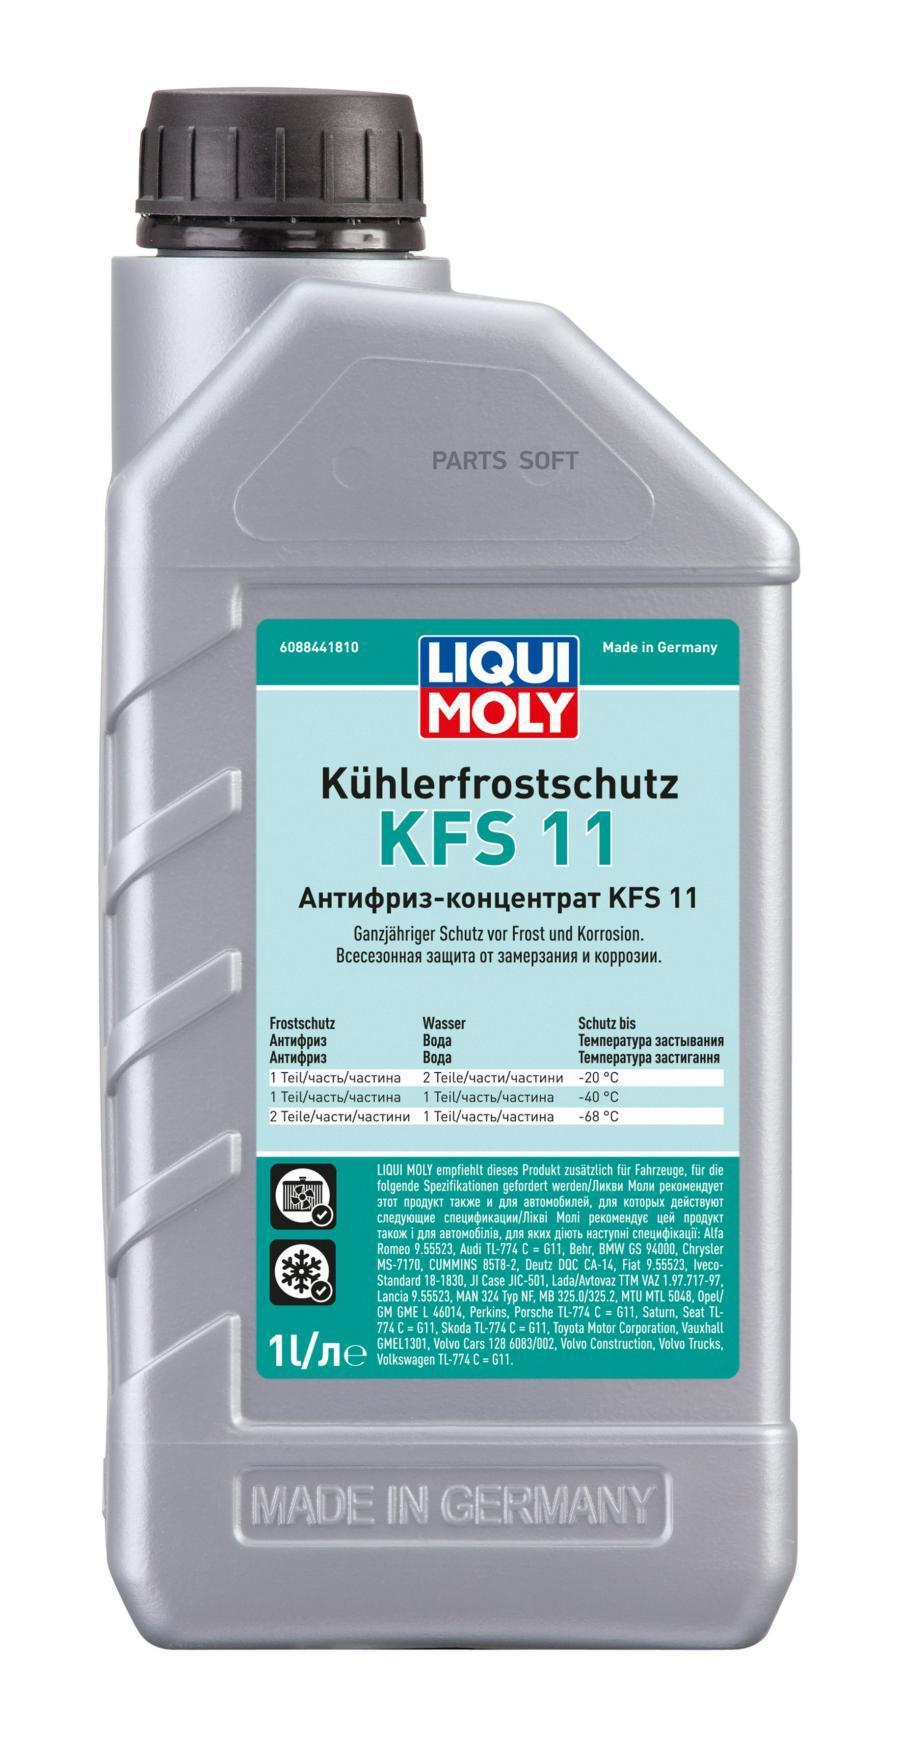 Антифриз-конц. Kuhlerfrostschutz KFS 2000 G11 (1л)